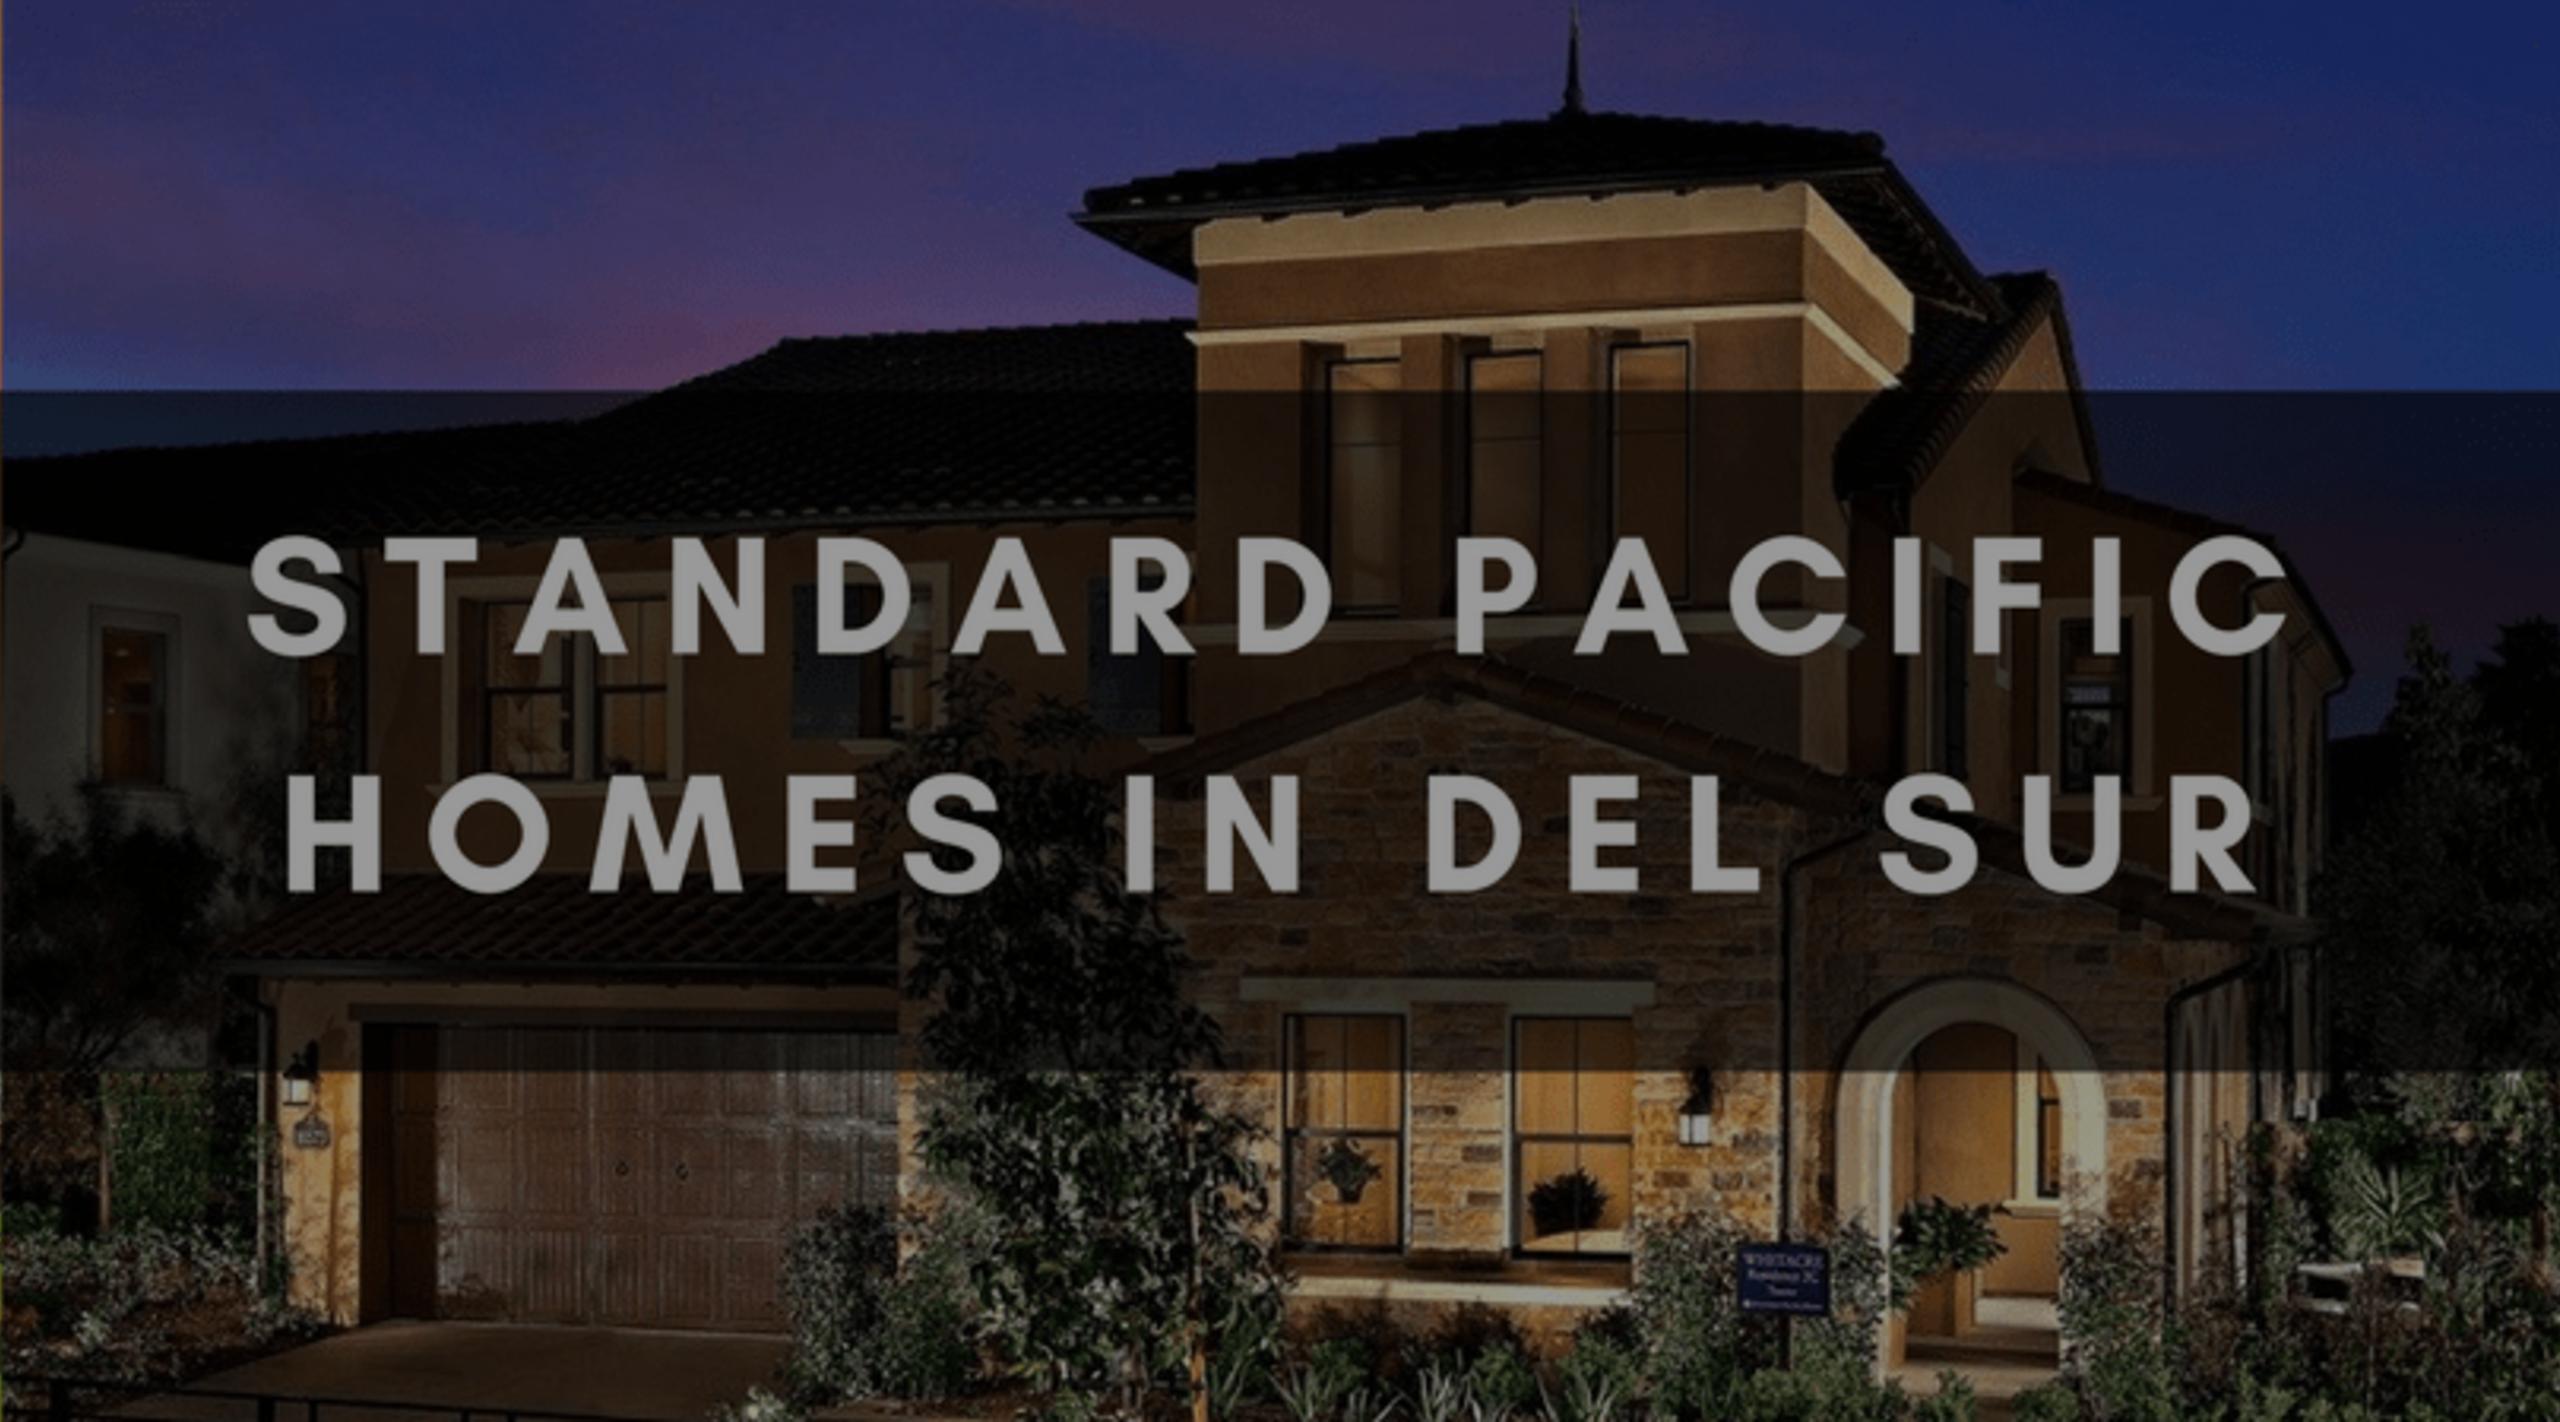 STANDARD PACIFIC HOMES IN DEL SUR